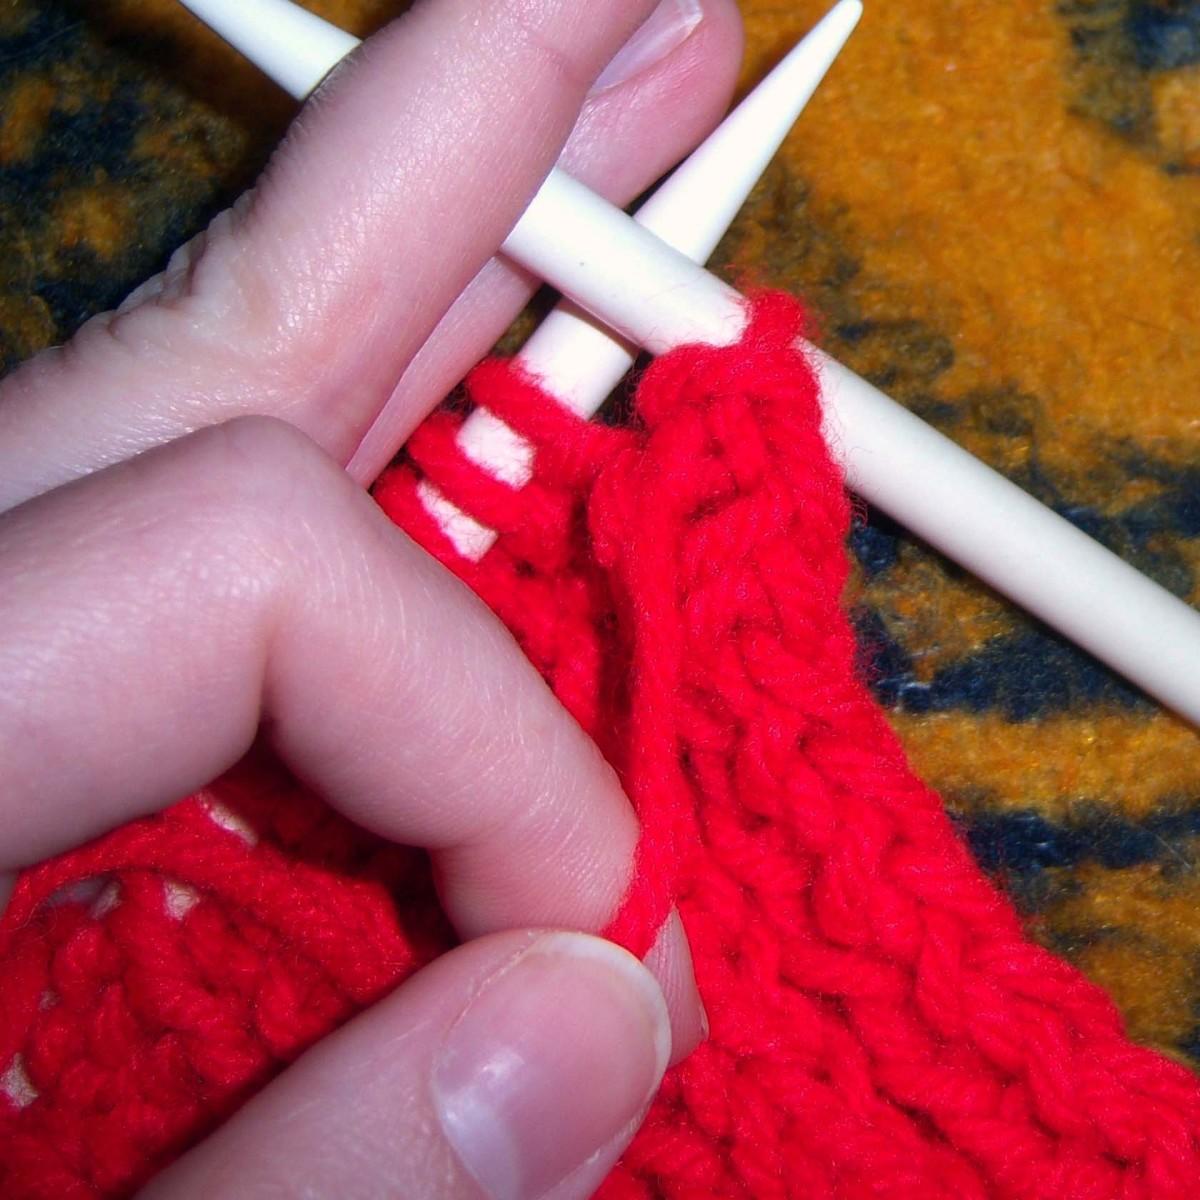 Purl the next stitch.